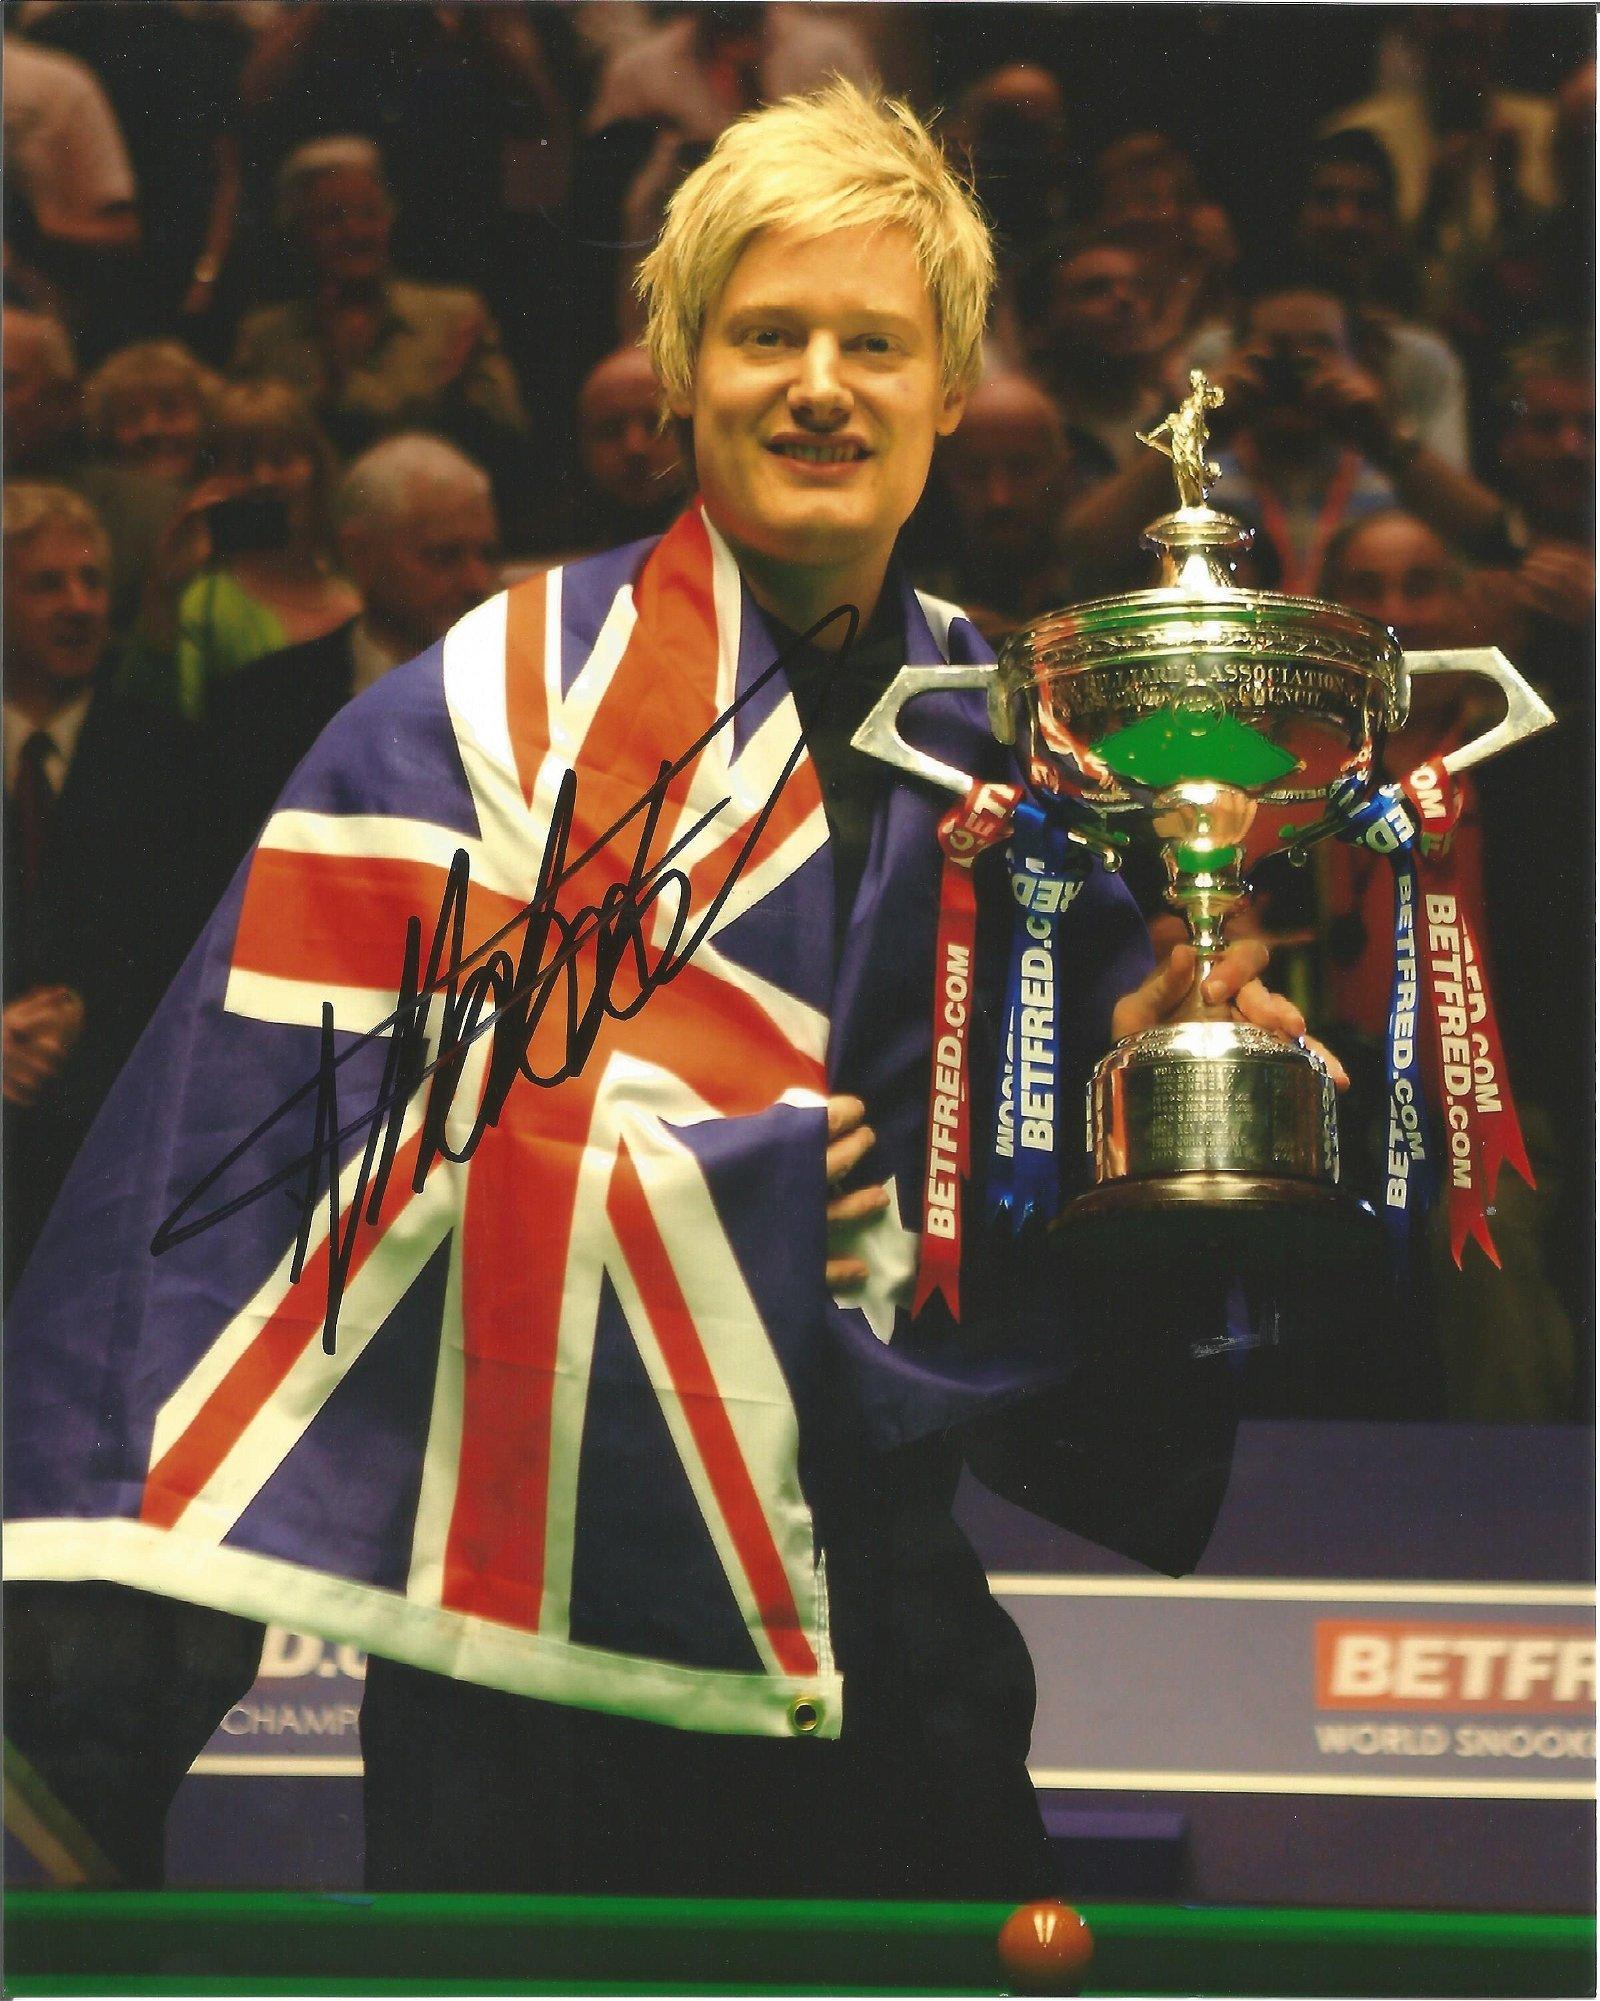 Neil Robertson Signed Snooker World Champion 8x10 Photo